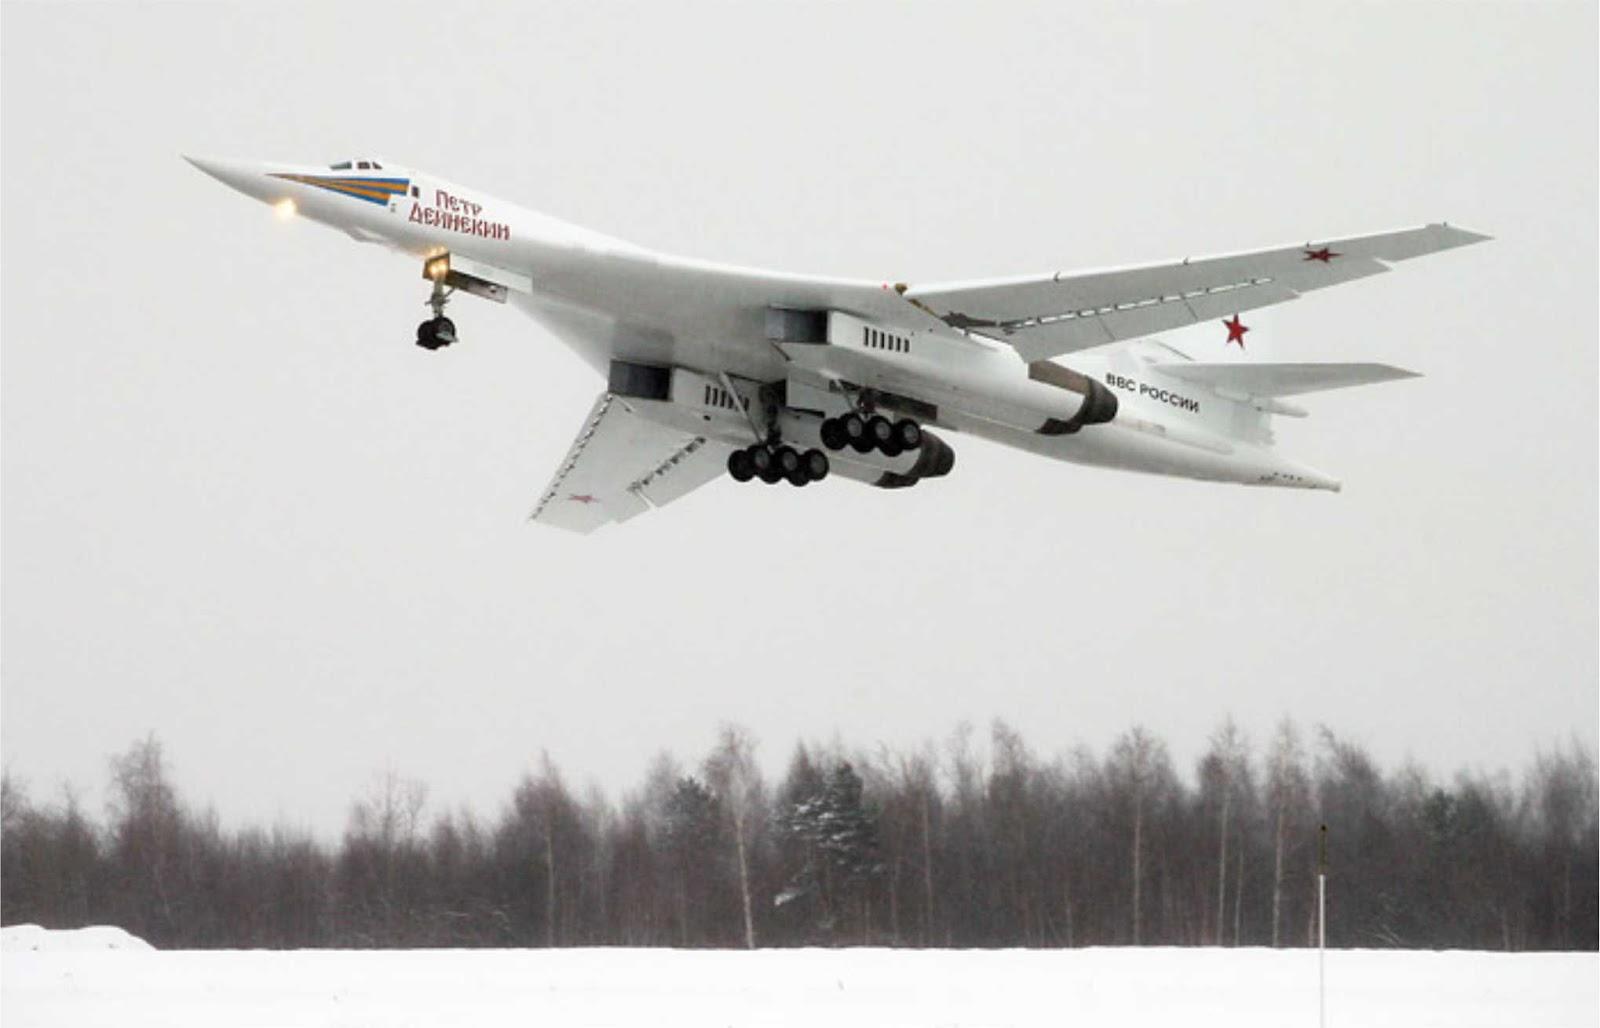 Pesawat bomber Tu-160 Rusia dikawal oleh pesawat tempur F-16 Norwegia